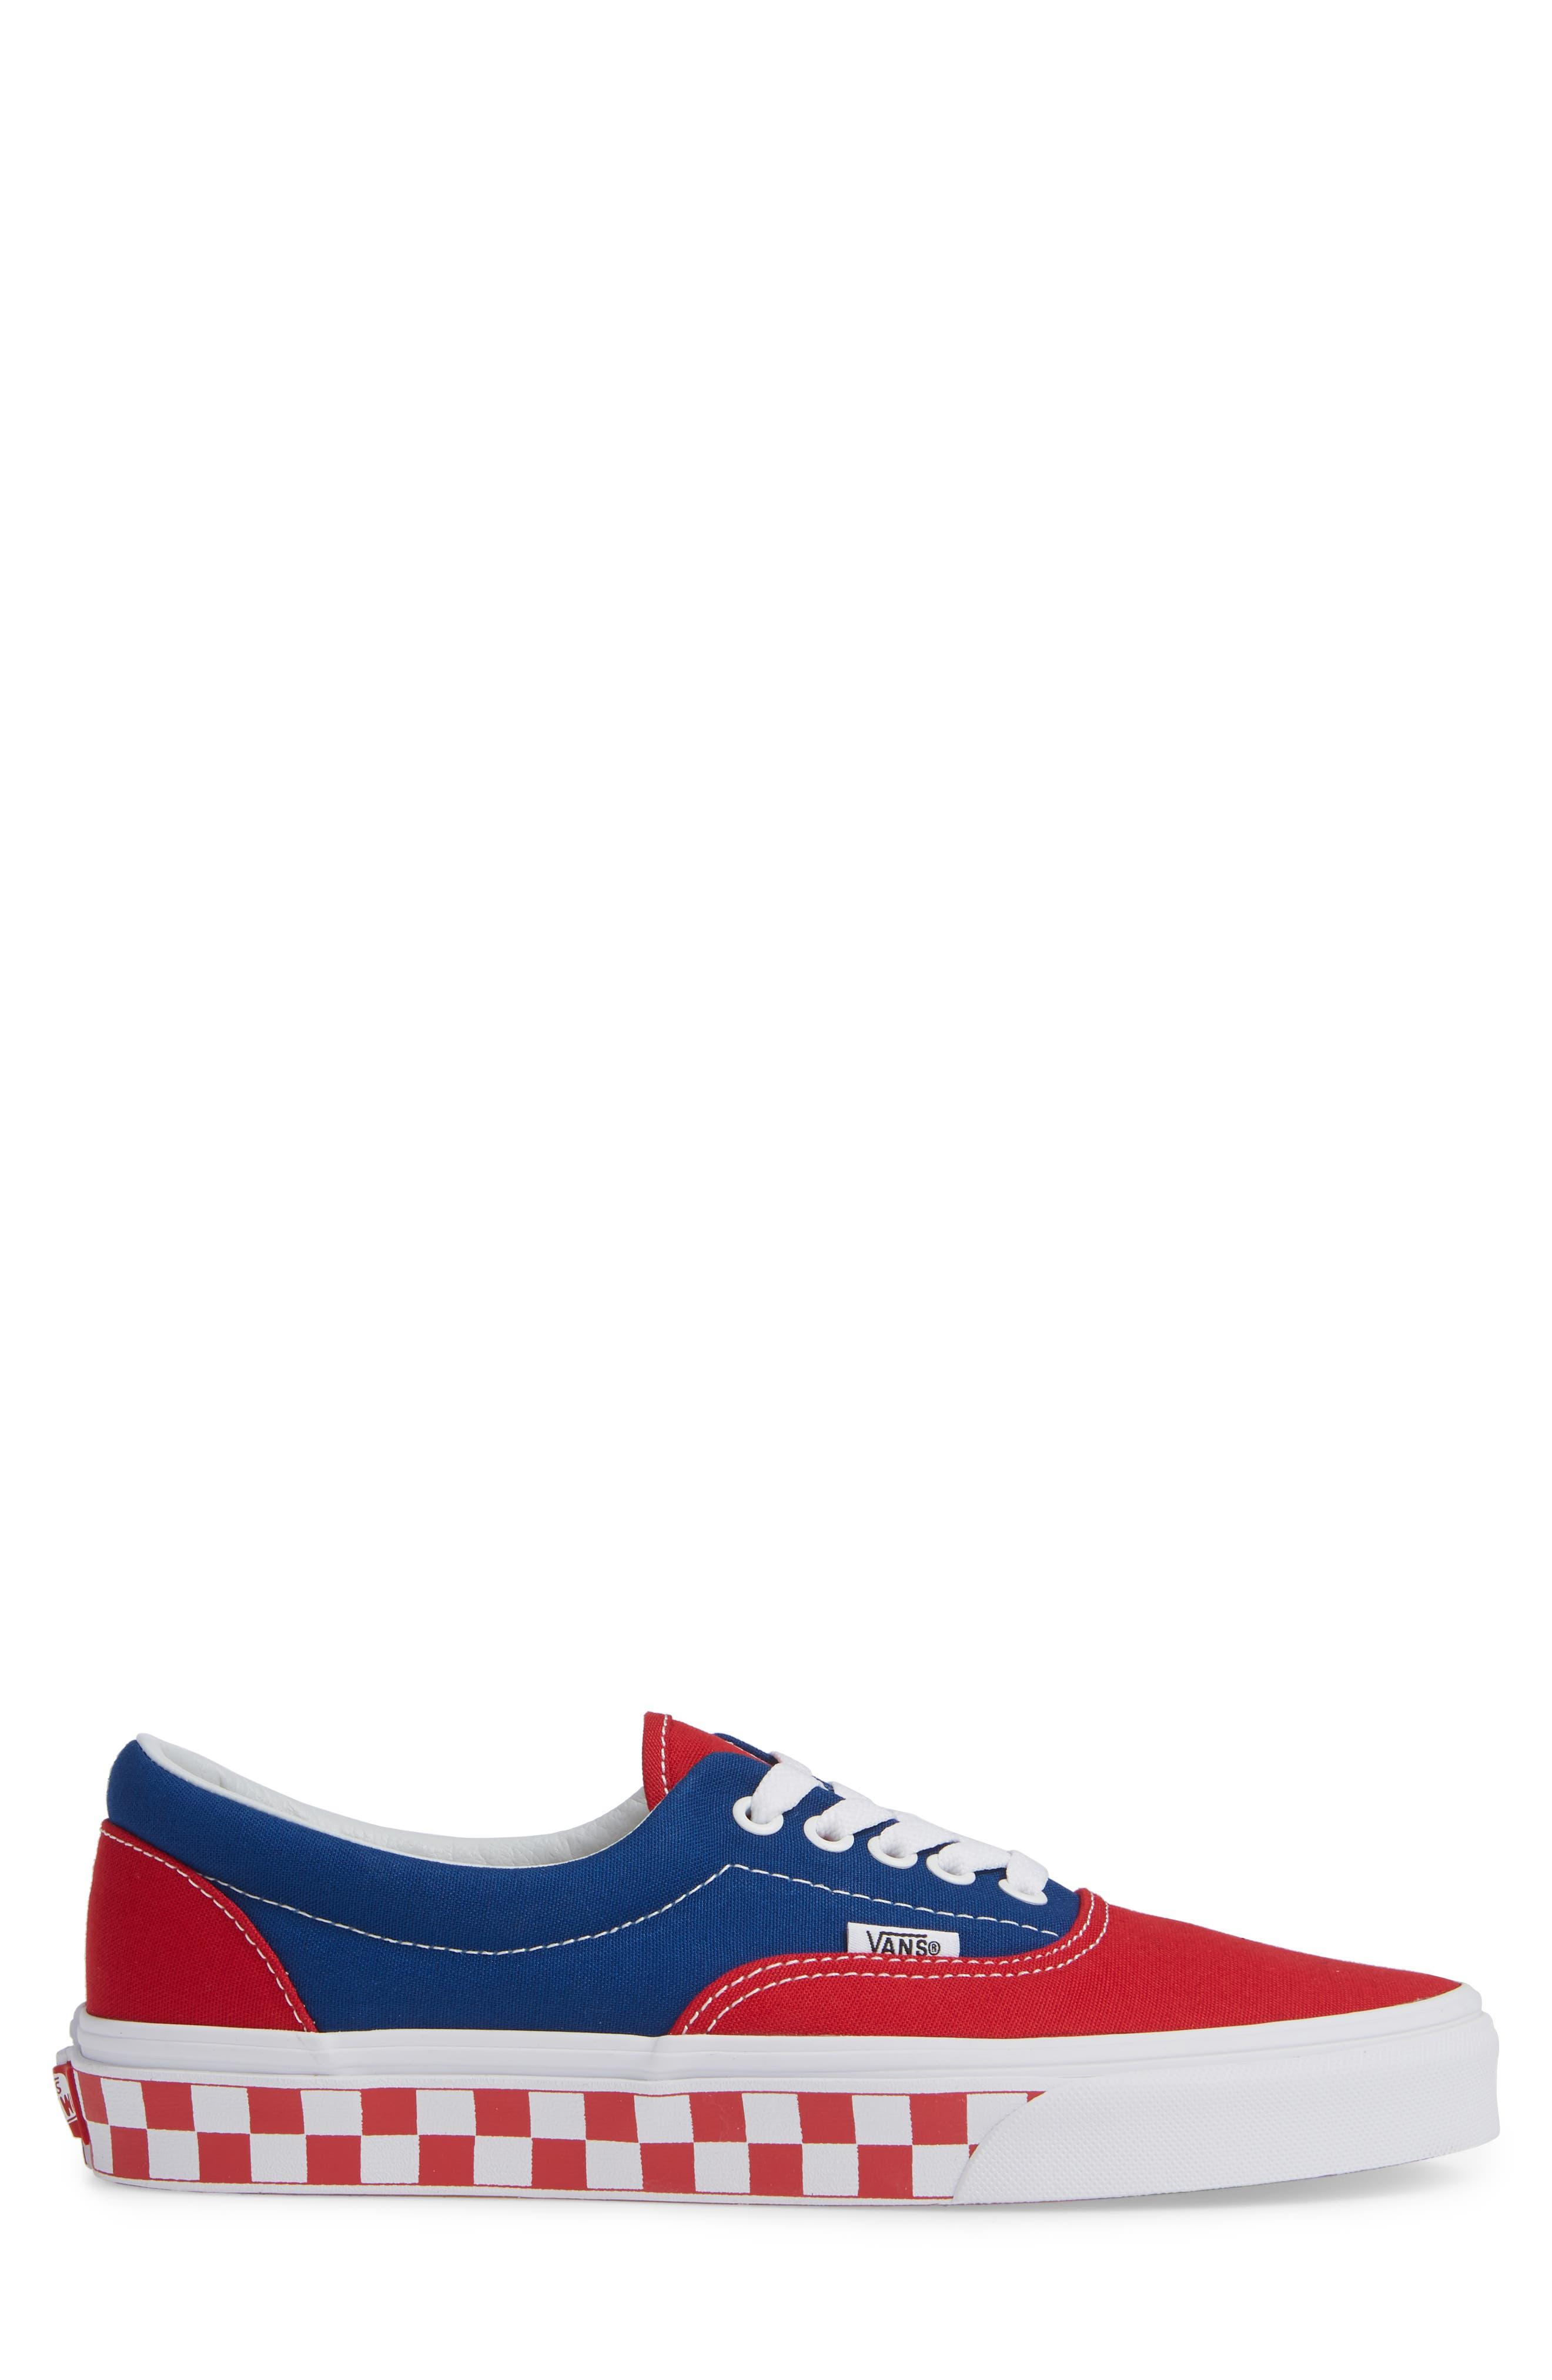 BMX Checkerboard Era Sneaker,                             Alternate thumbnail 3, color,                             BLUE/ RED CHECKER CANVAS